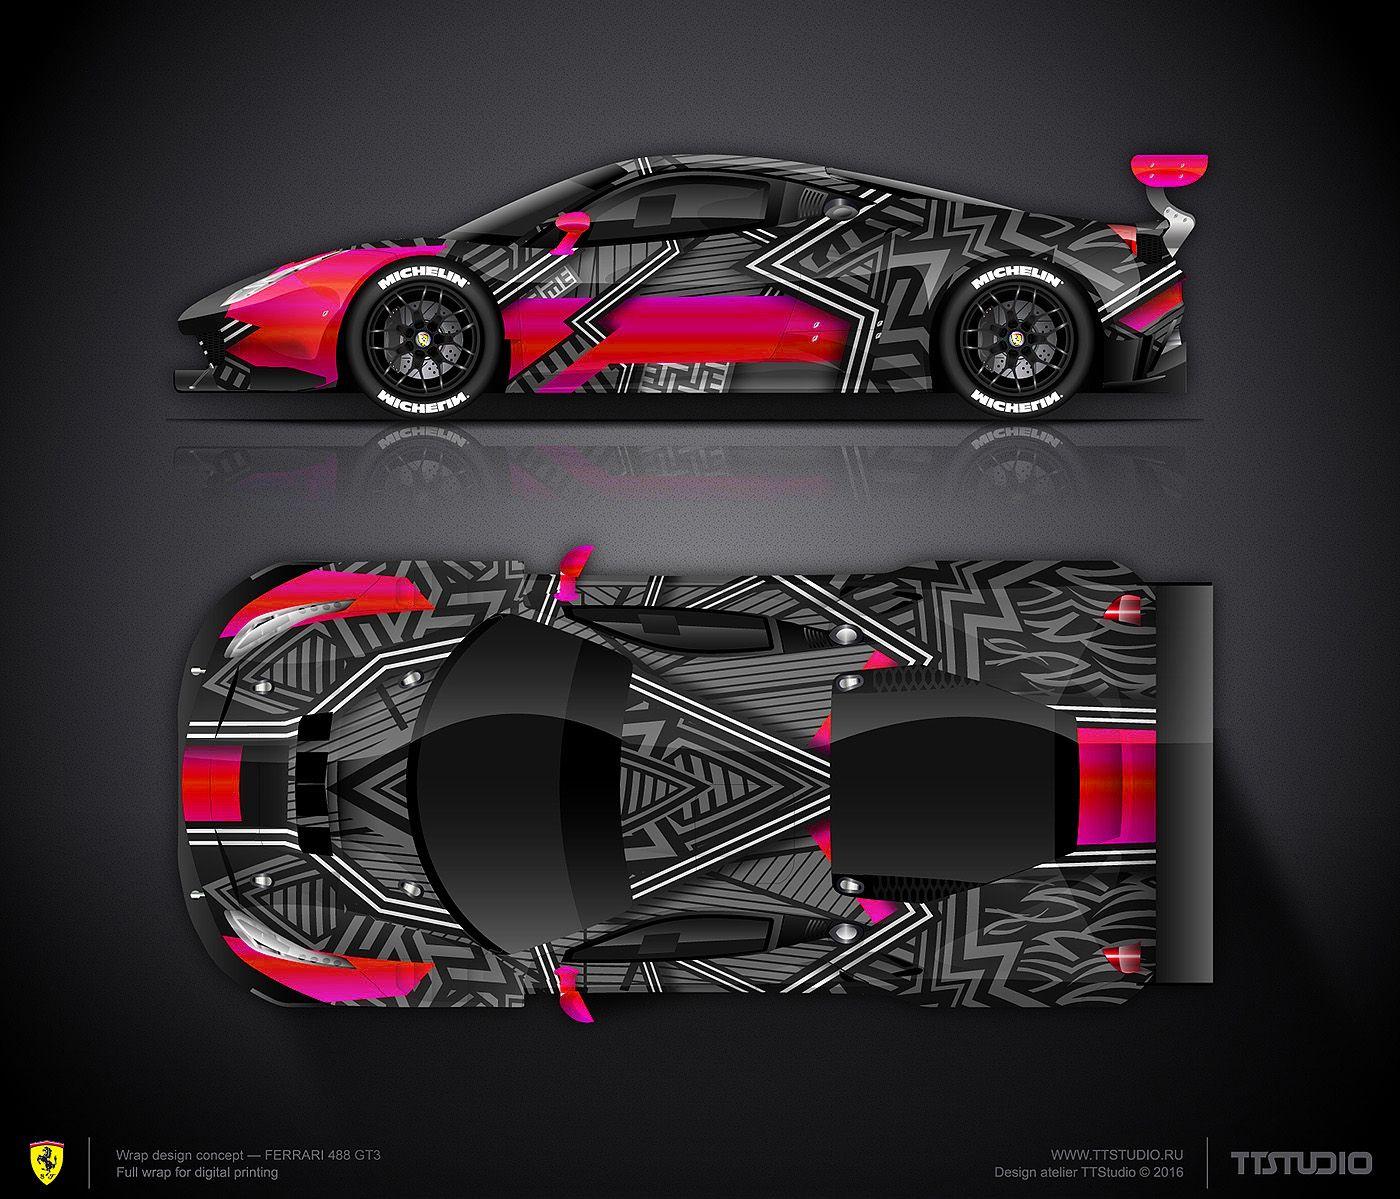 Auto Good Image: Wrap Design Concept Art Car For Ferrari F488 GT3 For Sale